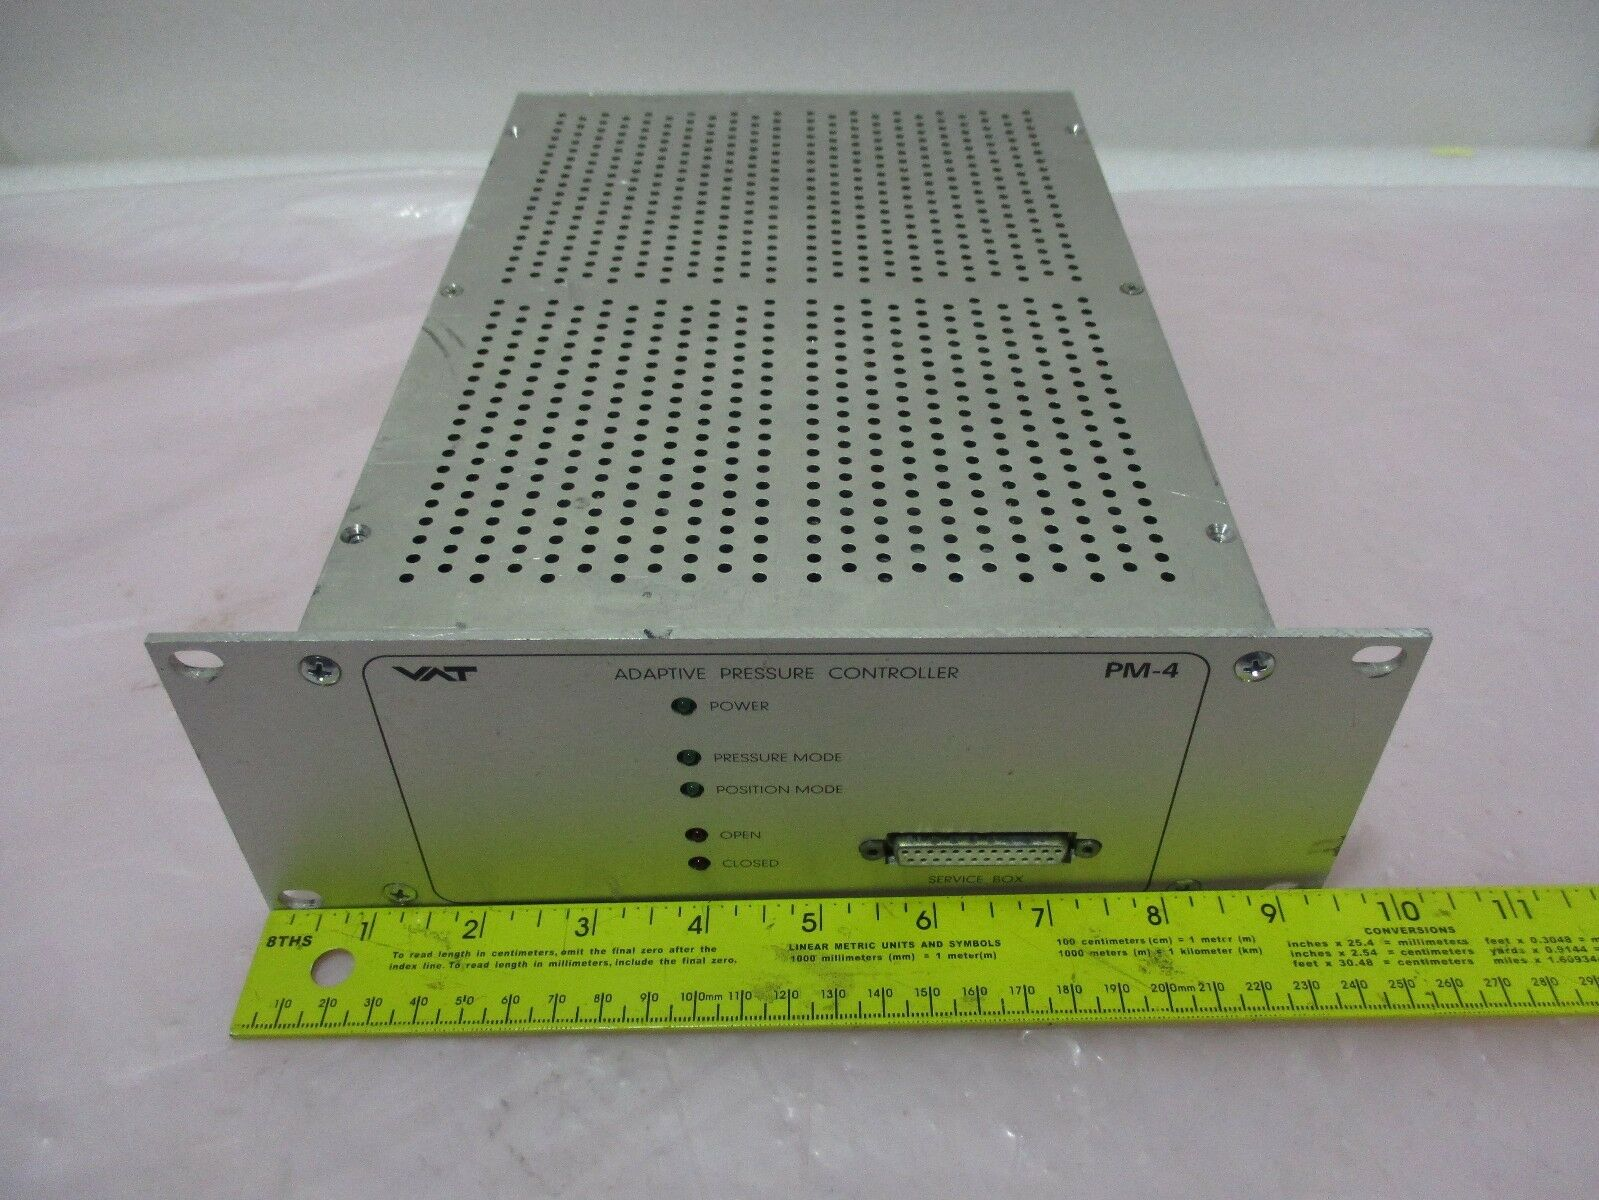 VAT PM-4 Adaptive Pressure Controller FABR 641PM-94NM-1001/001  420428